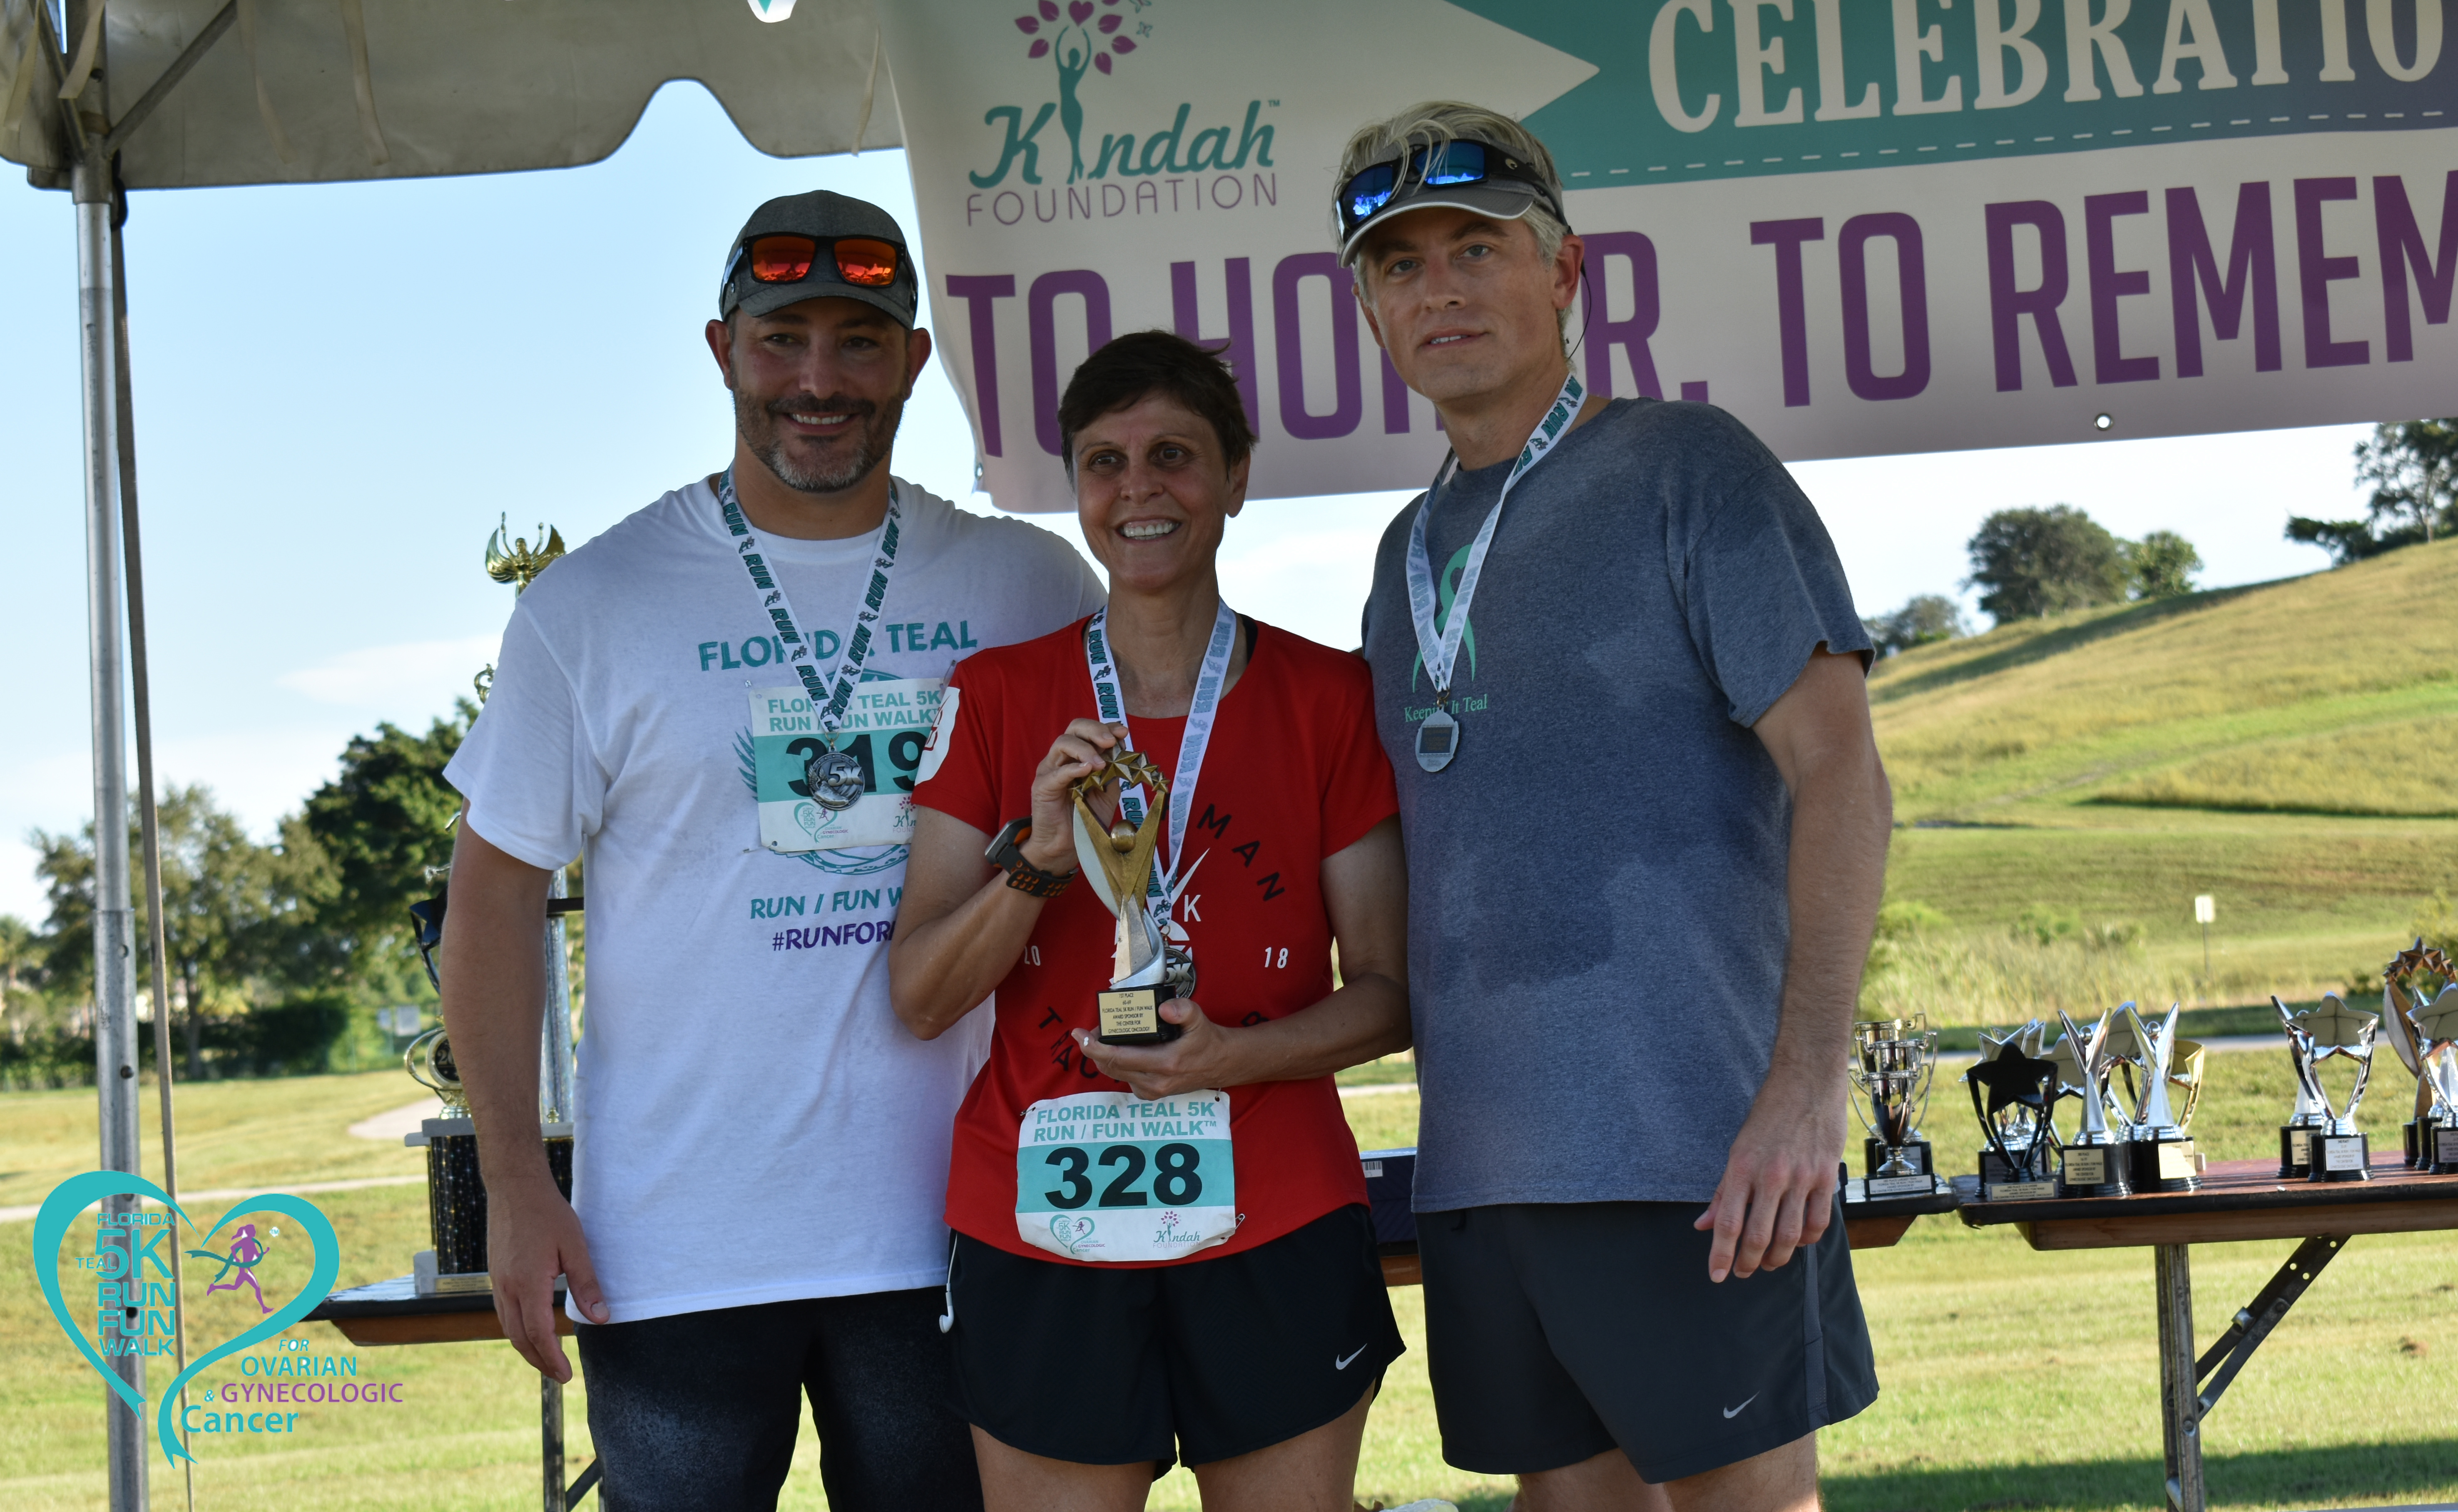 DSC 0163 - Florida Teal 5K Run 2018